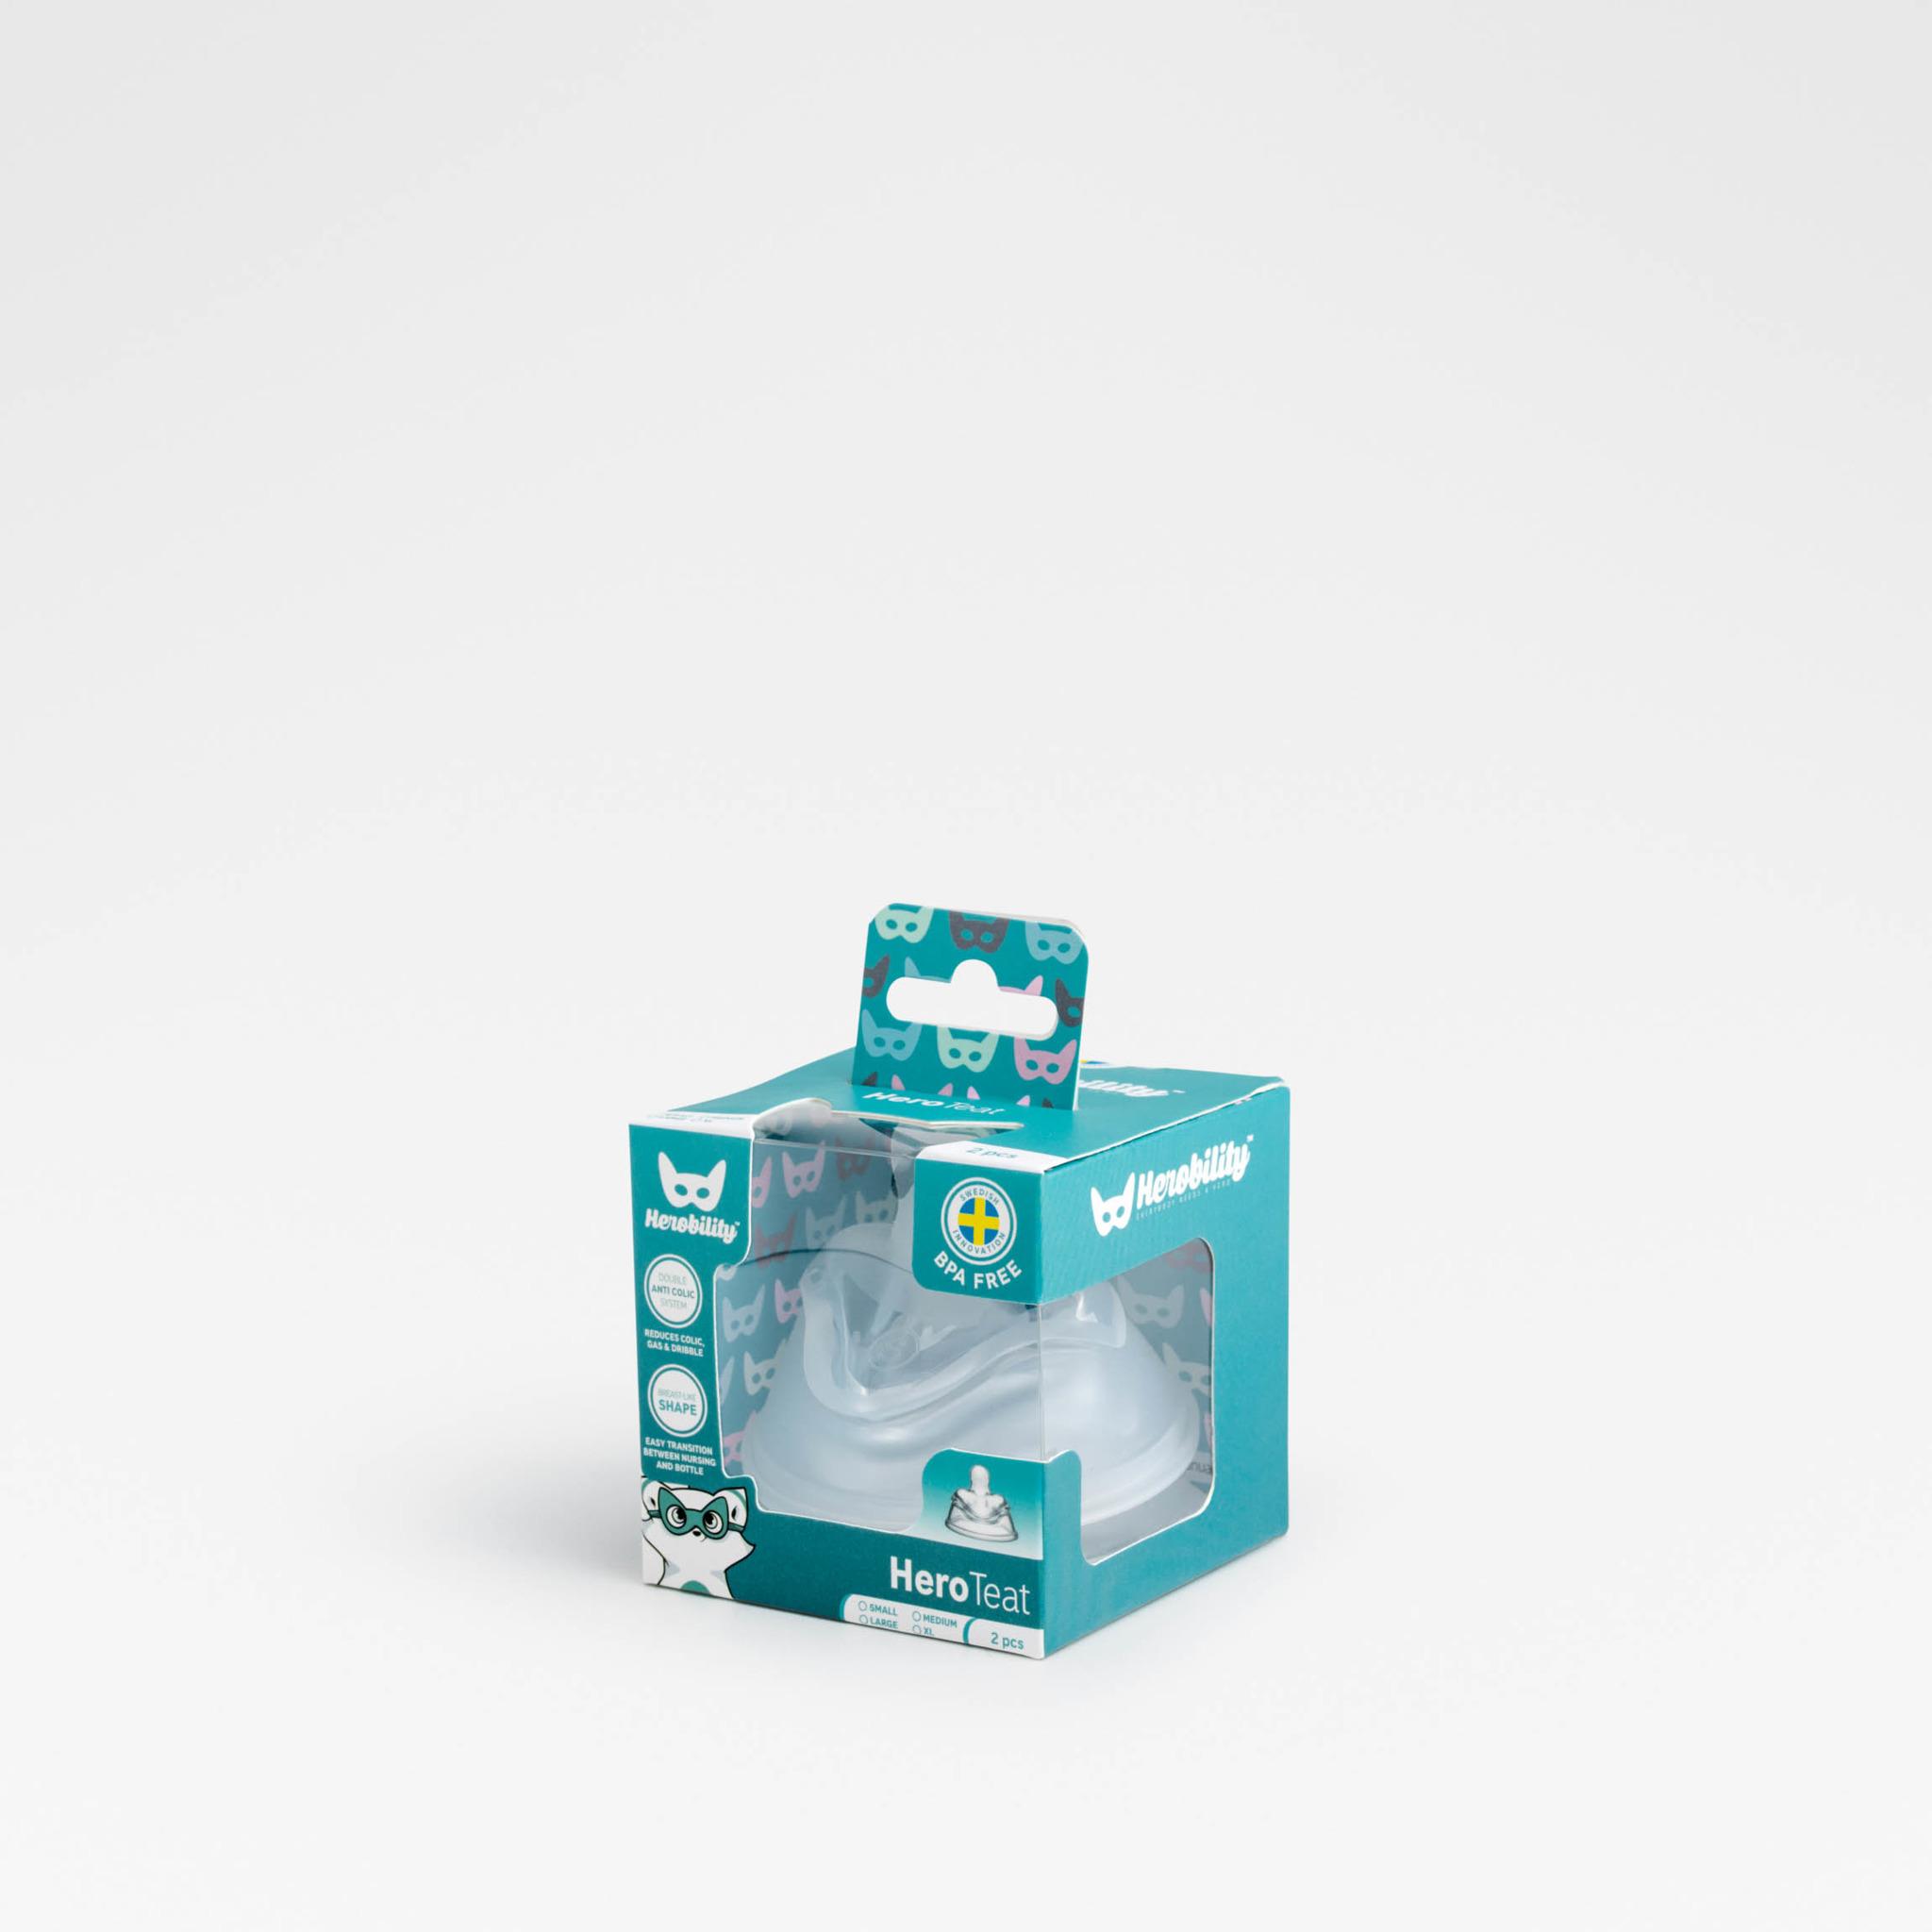 Herobility - smoczek antykolkowy HeroTeat, XL (6 m+), 2 szt.